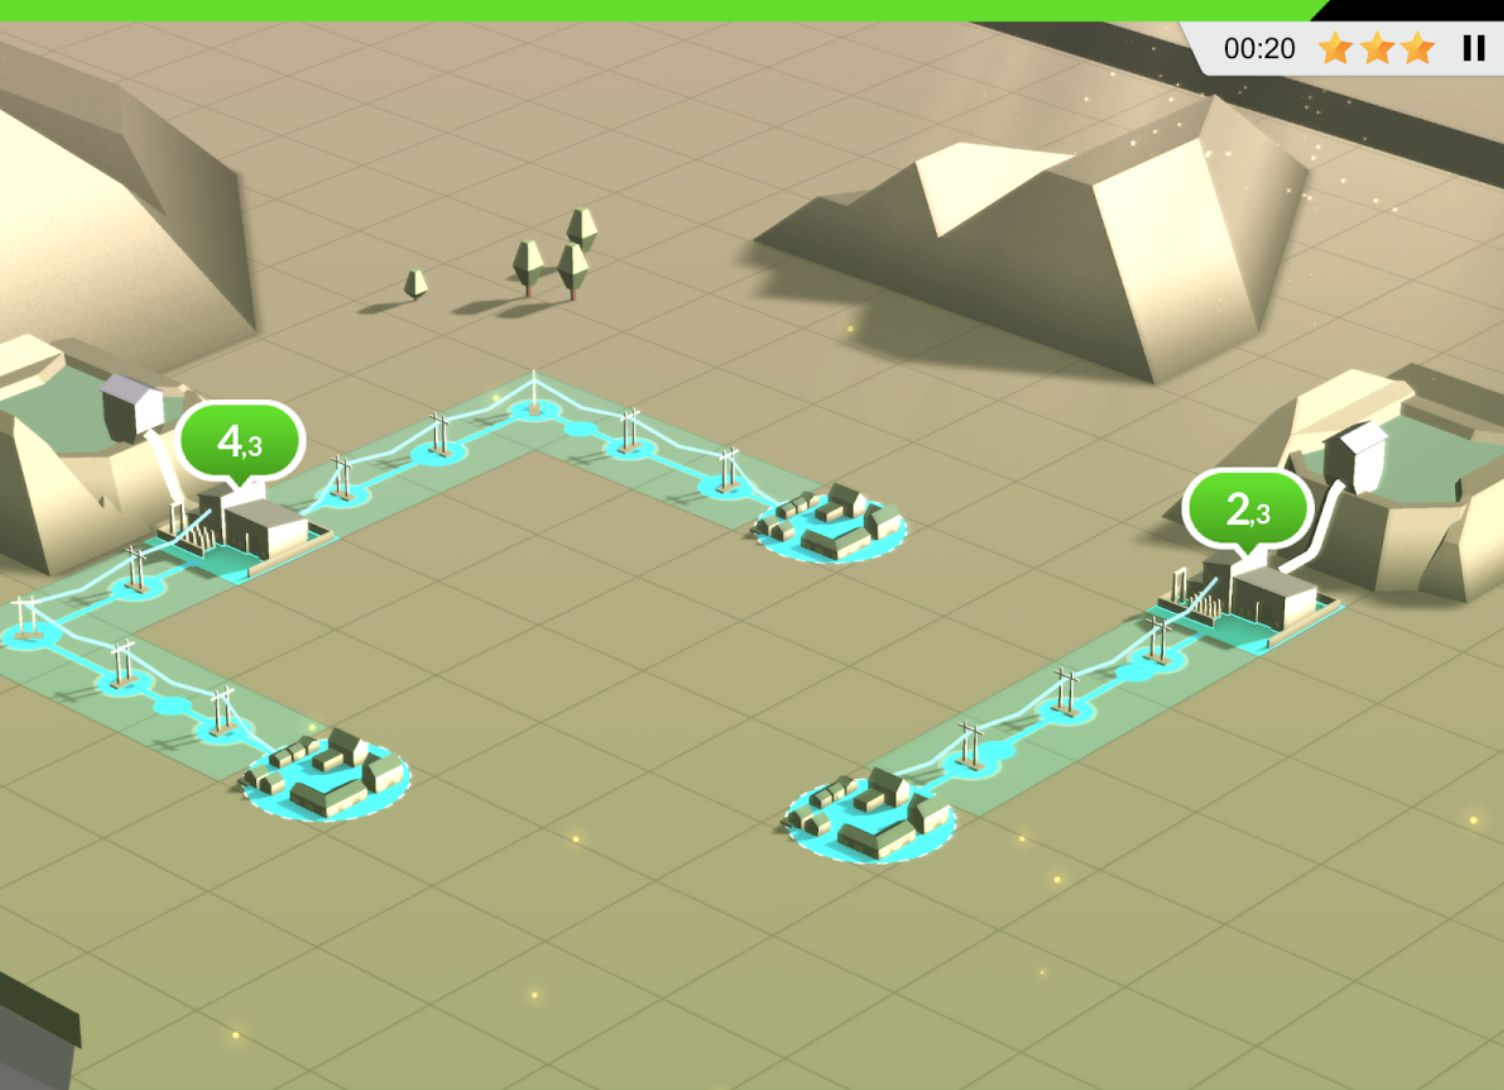 Balance_Game_1504_1090_80.jpg